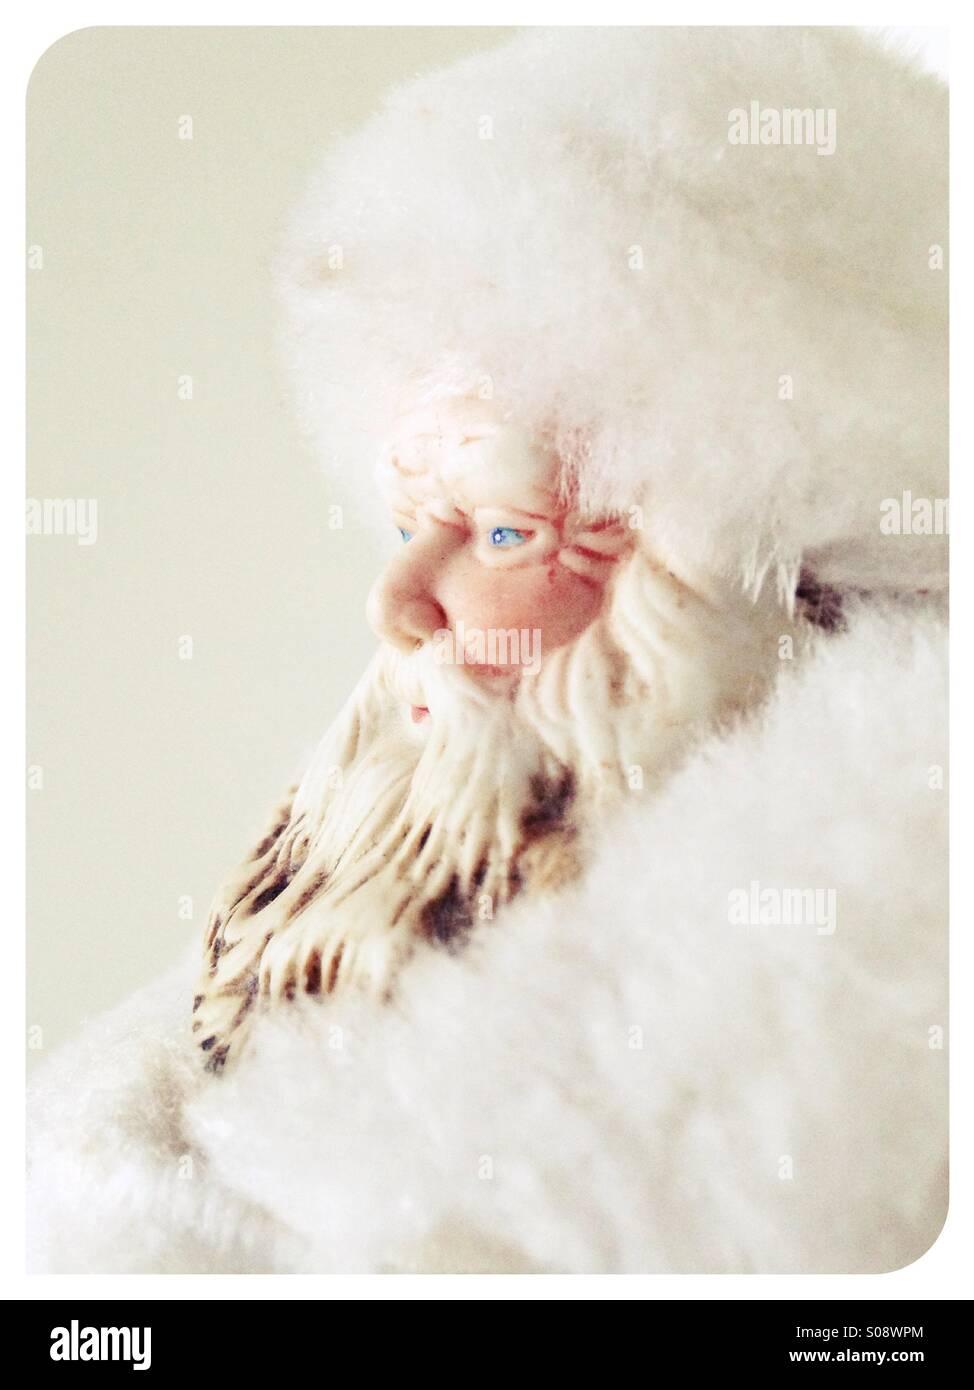 A Santa Claus figurine, all in white. - Stock Image